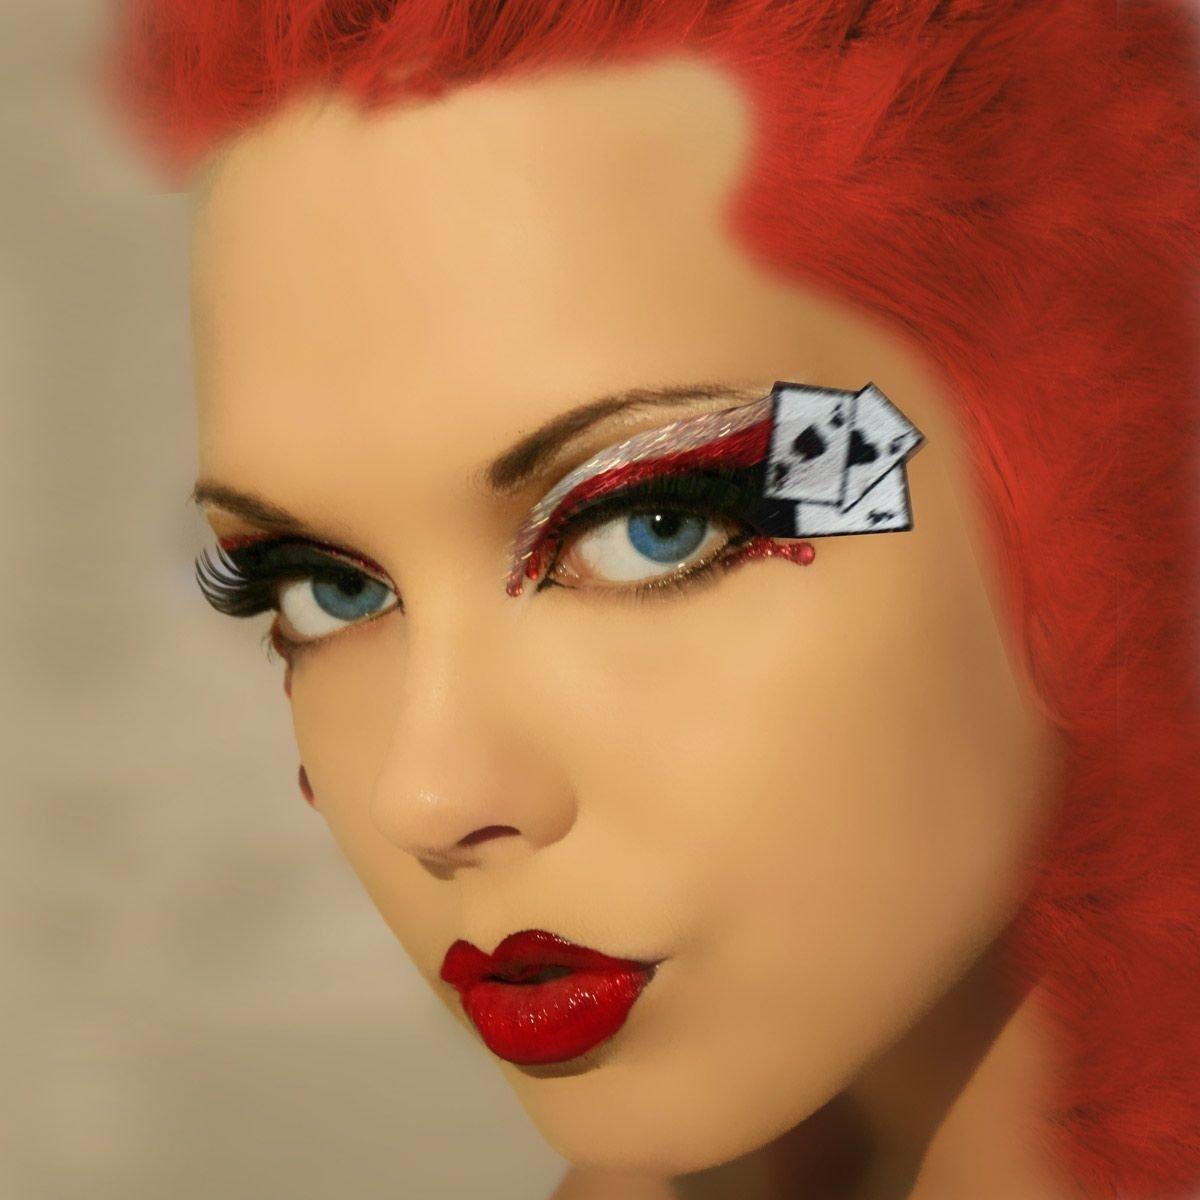 10 Trendy Queen Of Hearts Makeup Ideas queen of hearts xotic eyes make up las vegas showgirl dancer 2020